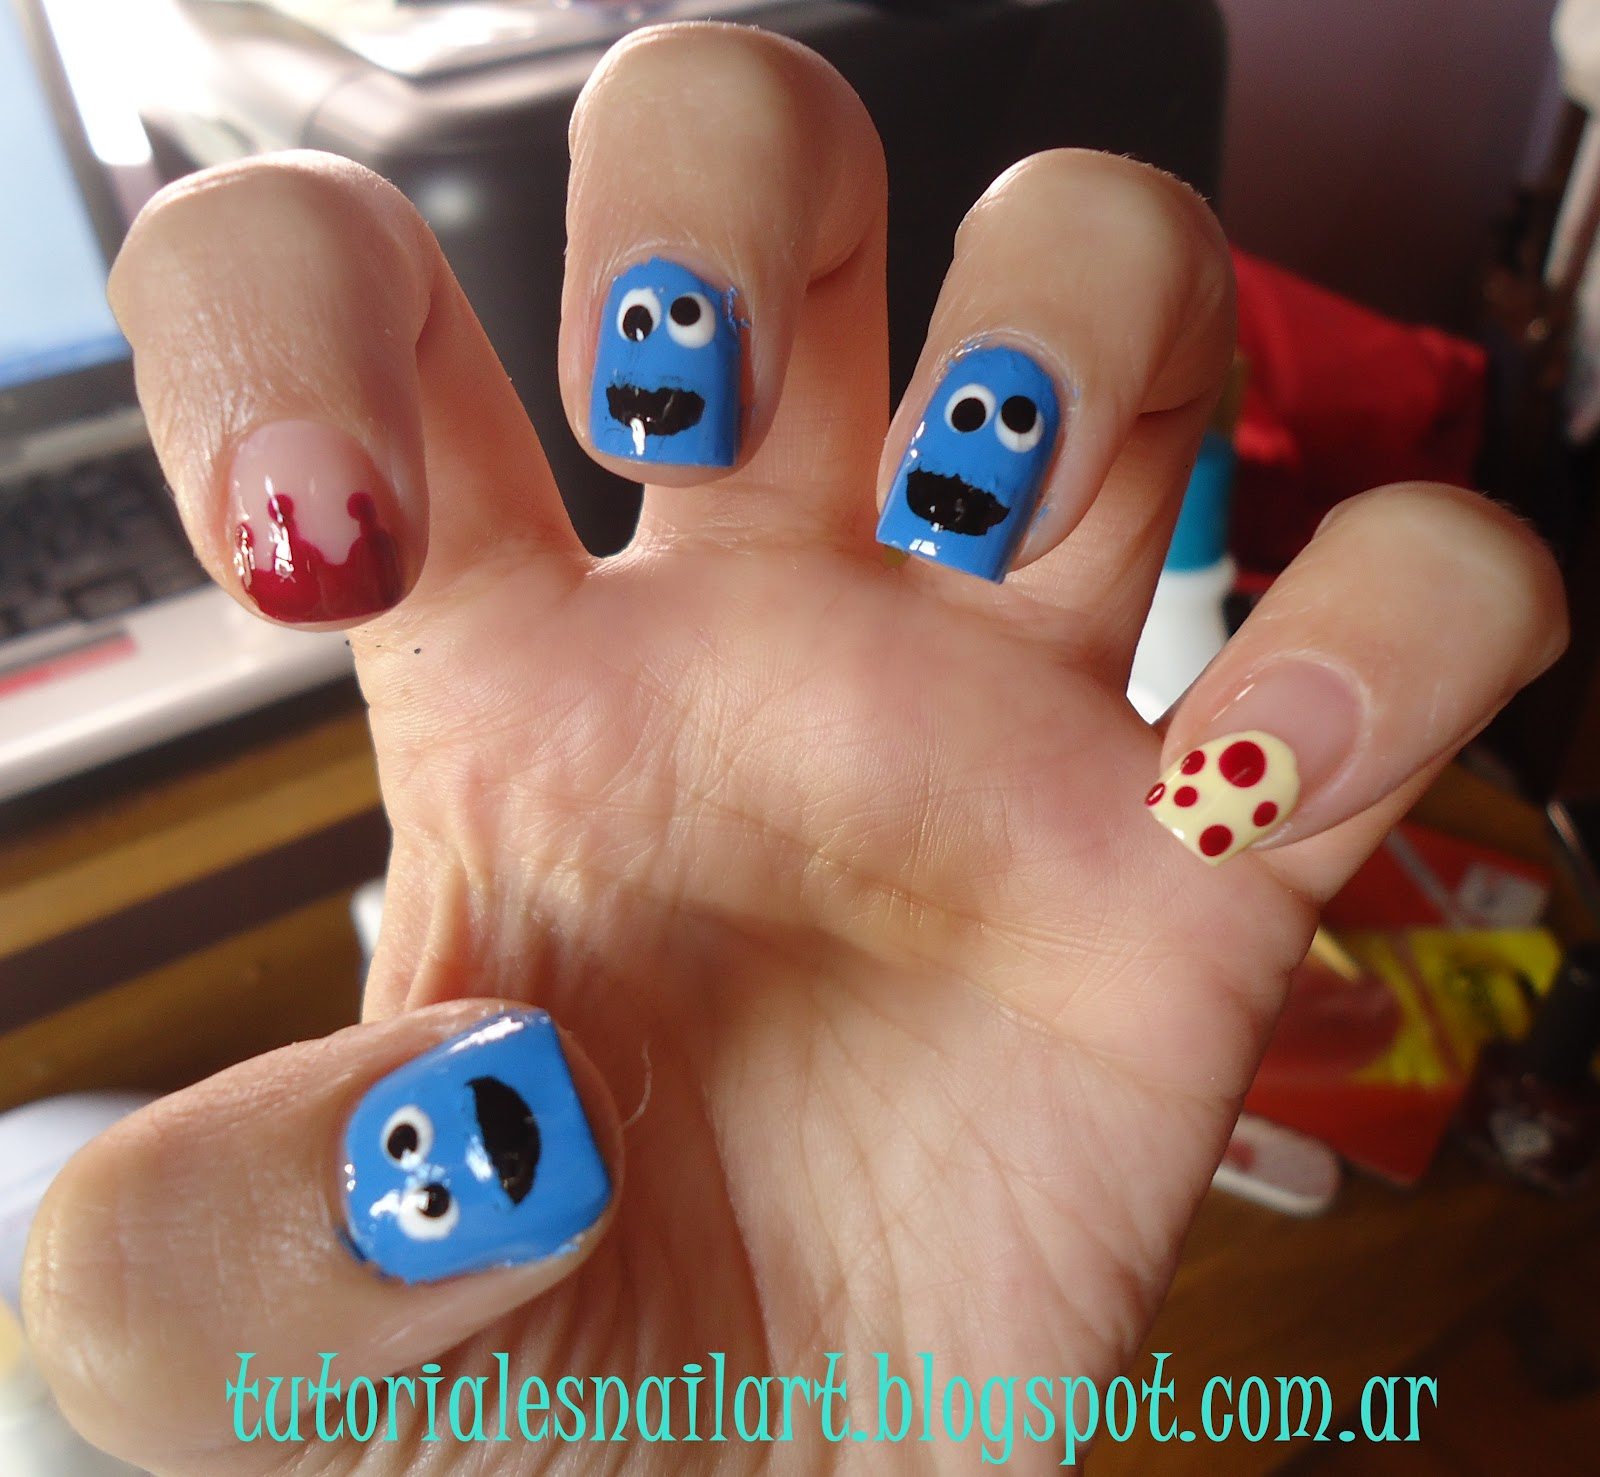 Tutoriales Nail Art: Semana Muppet, hoy: Uñas Monstruo Come Galletas